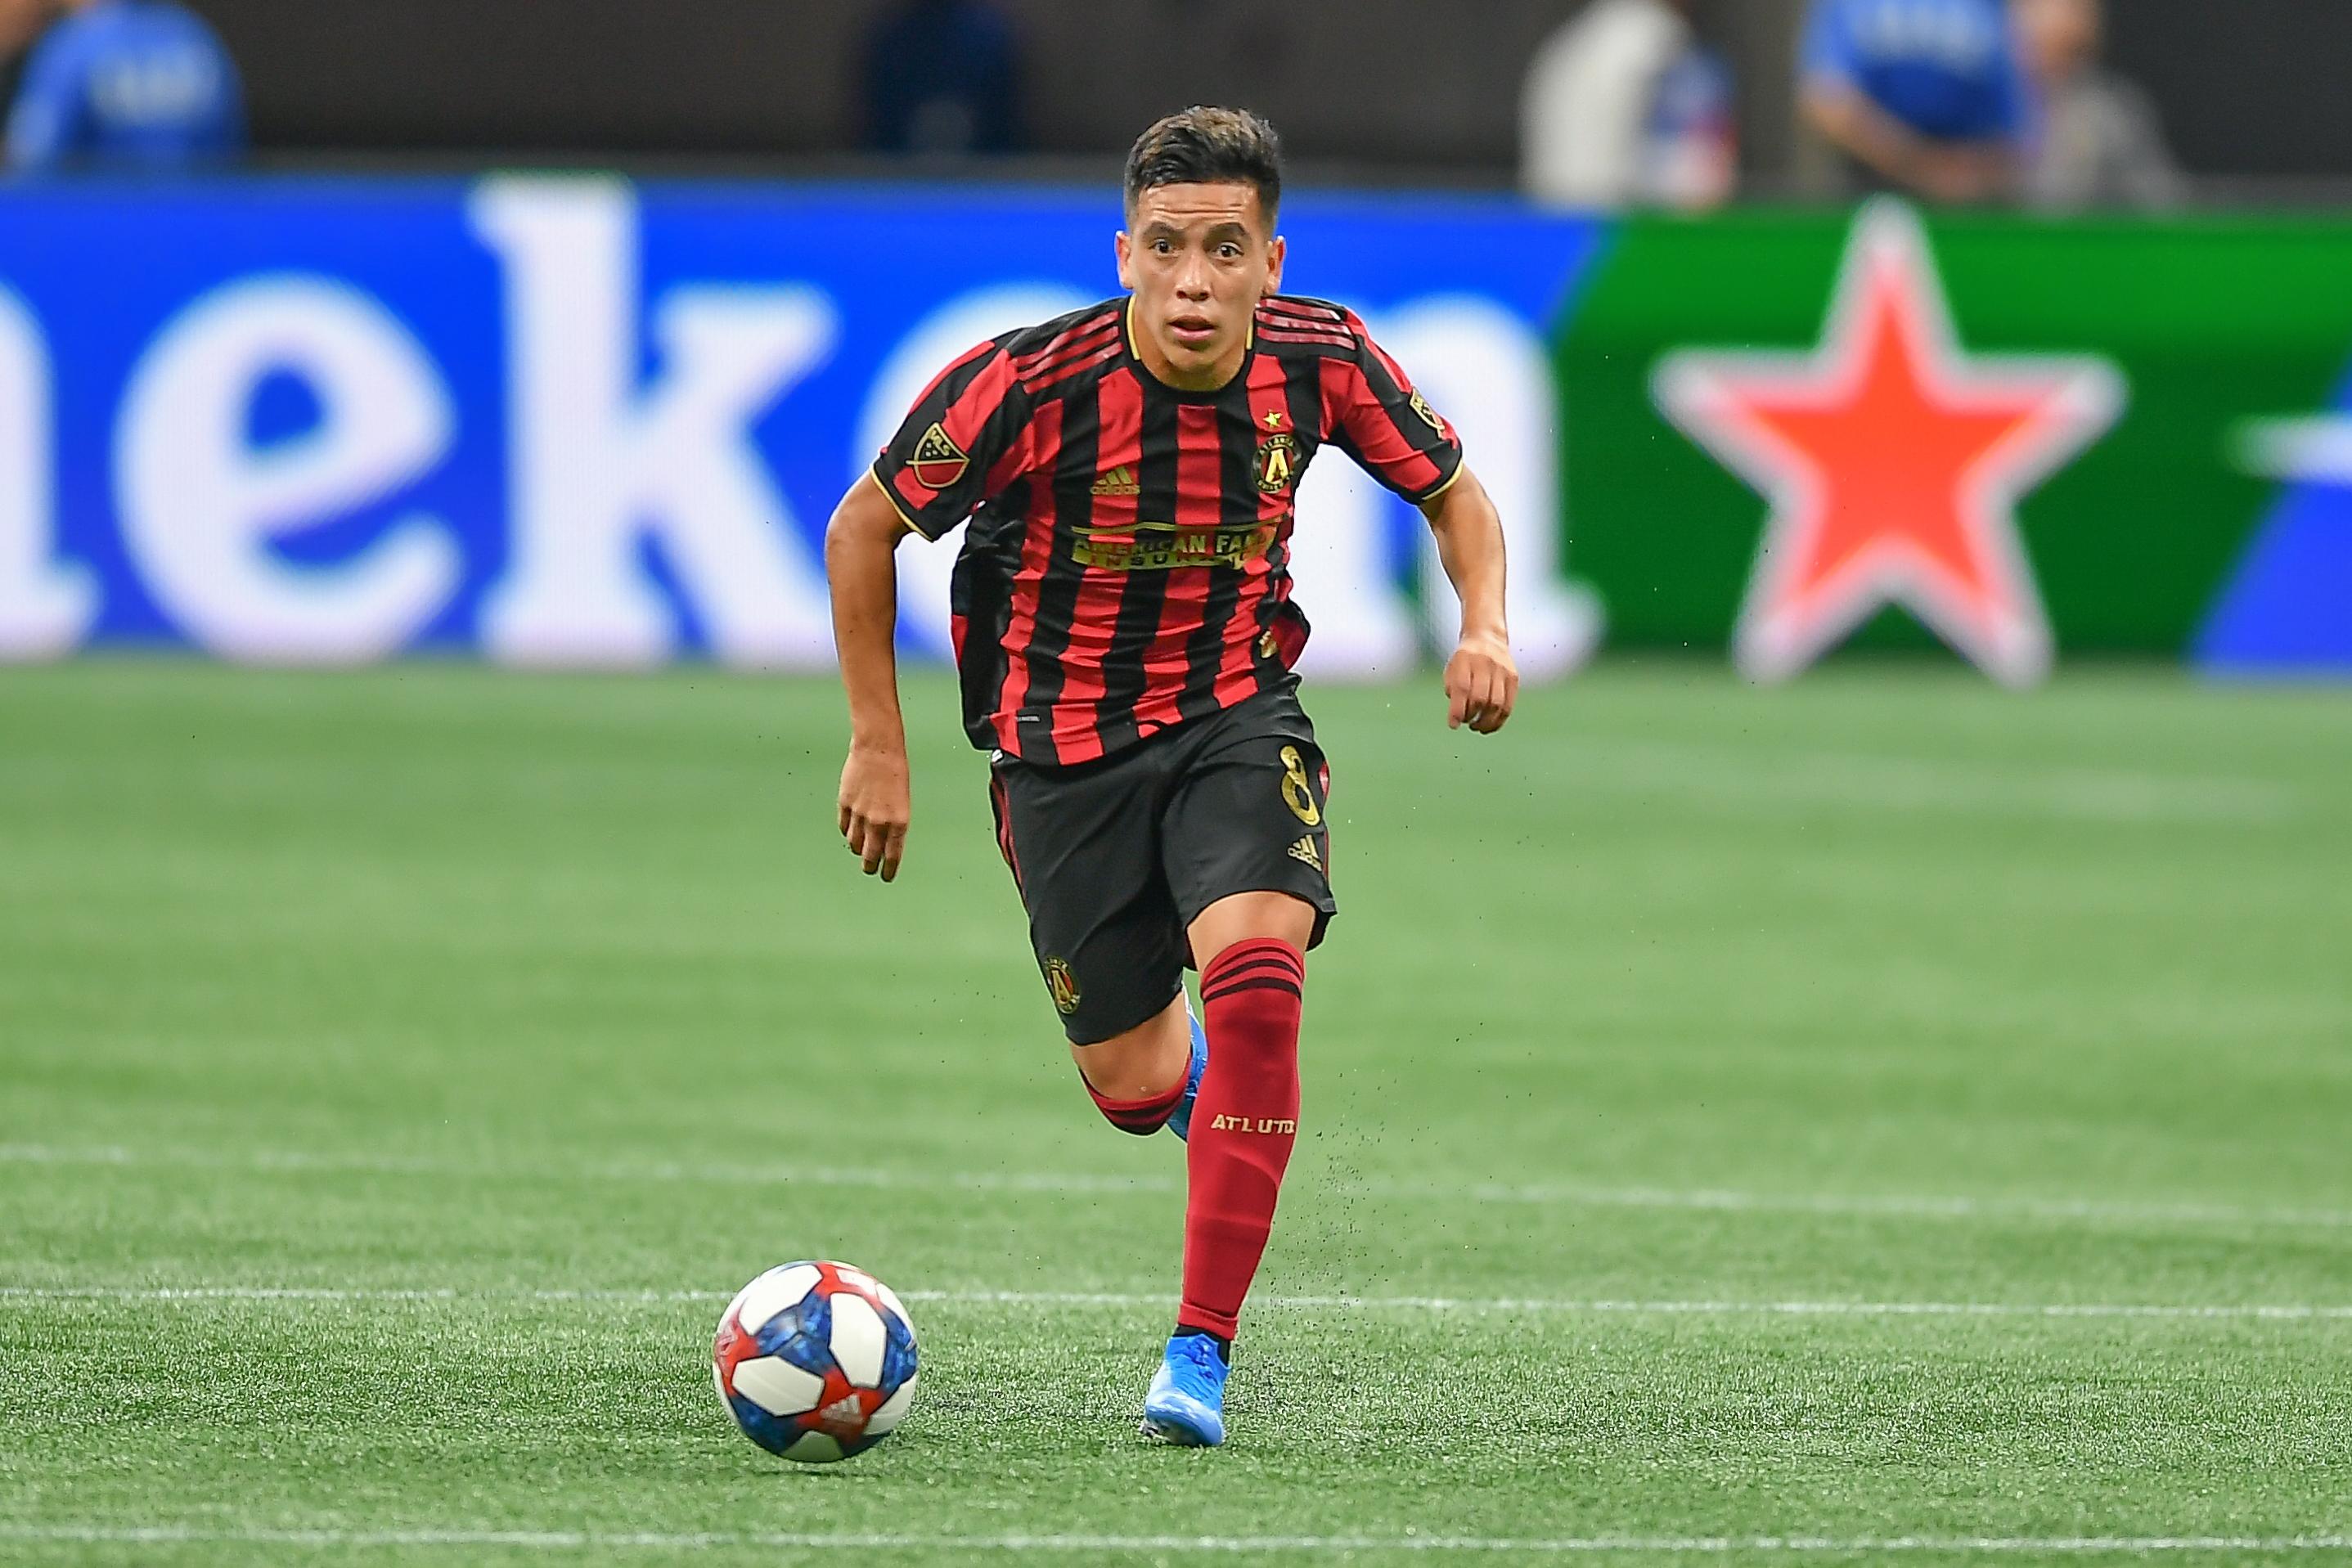 SOCCER: AUG 11 MLS - New York City FC at Atlanta United FC